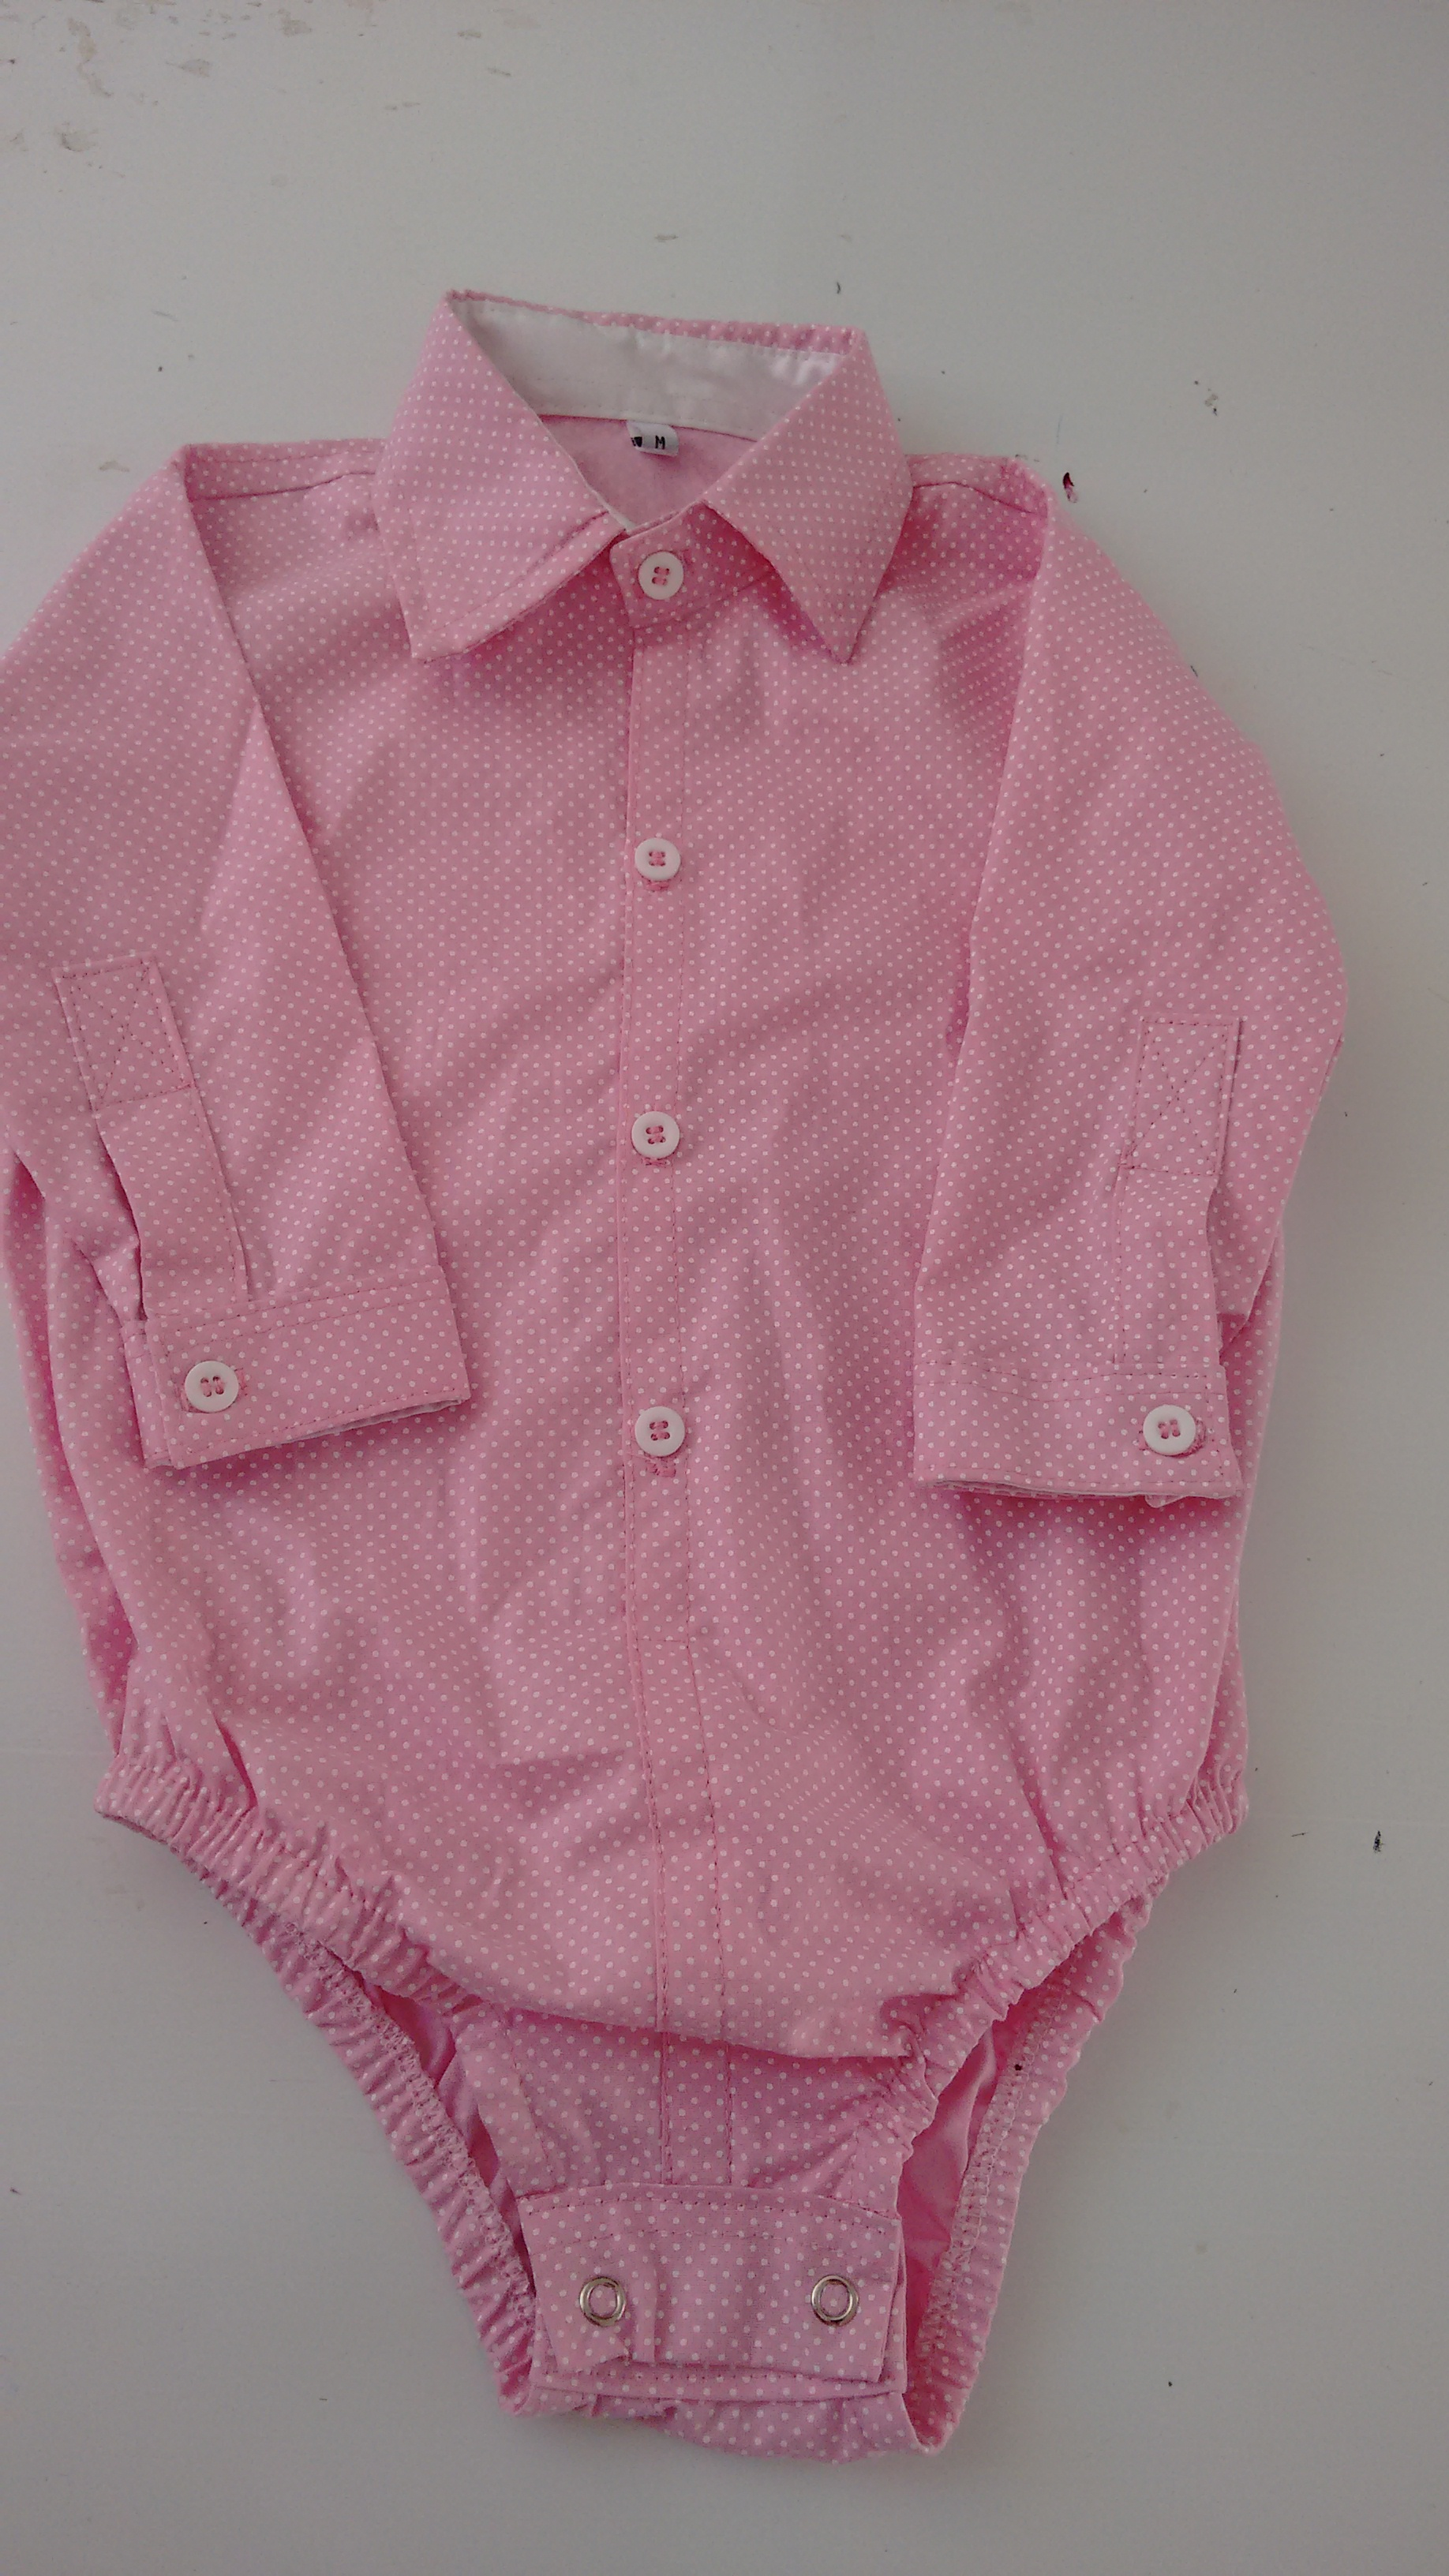 7da0f7b67b41 Body Camisa Social Rosa Meninas | Elo7